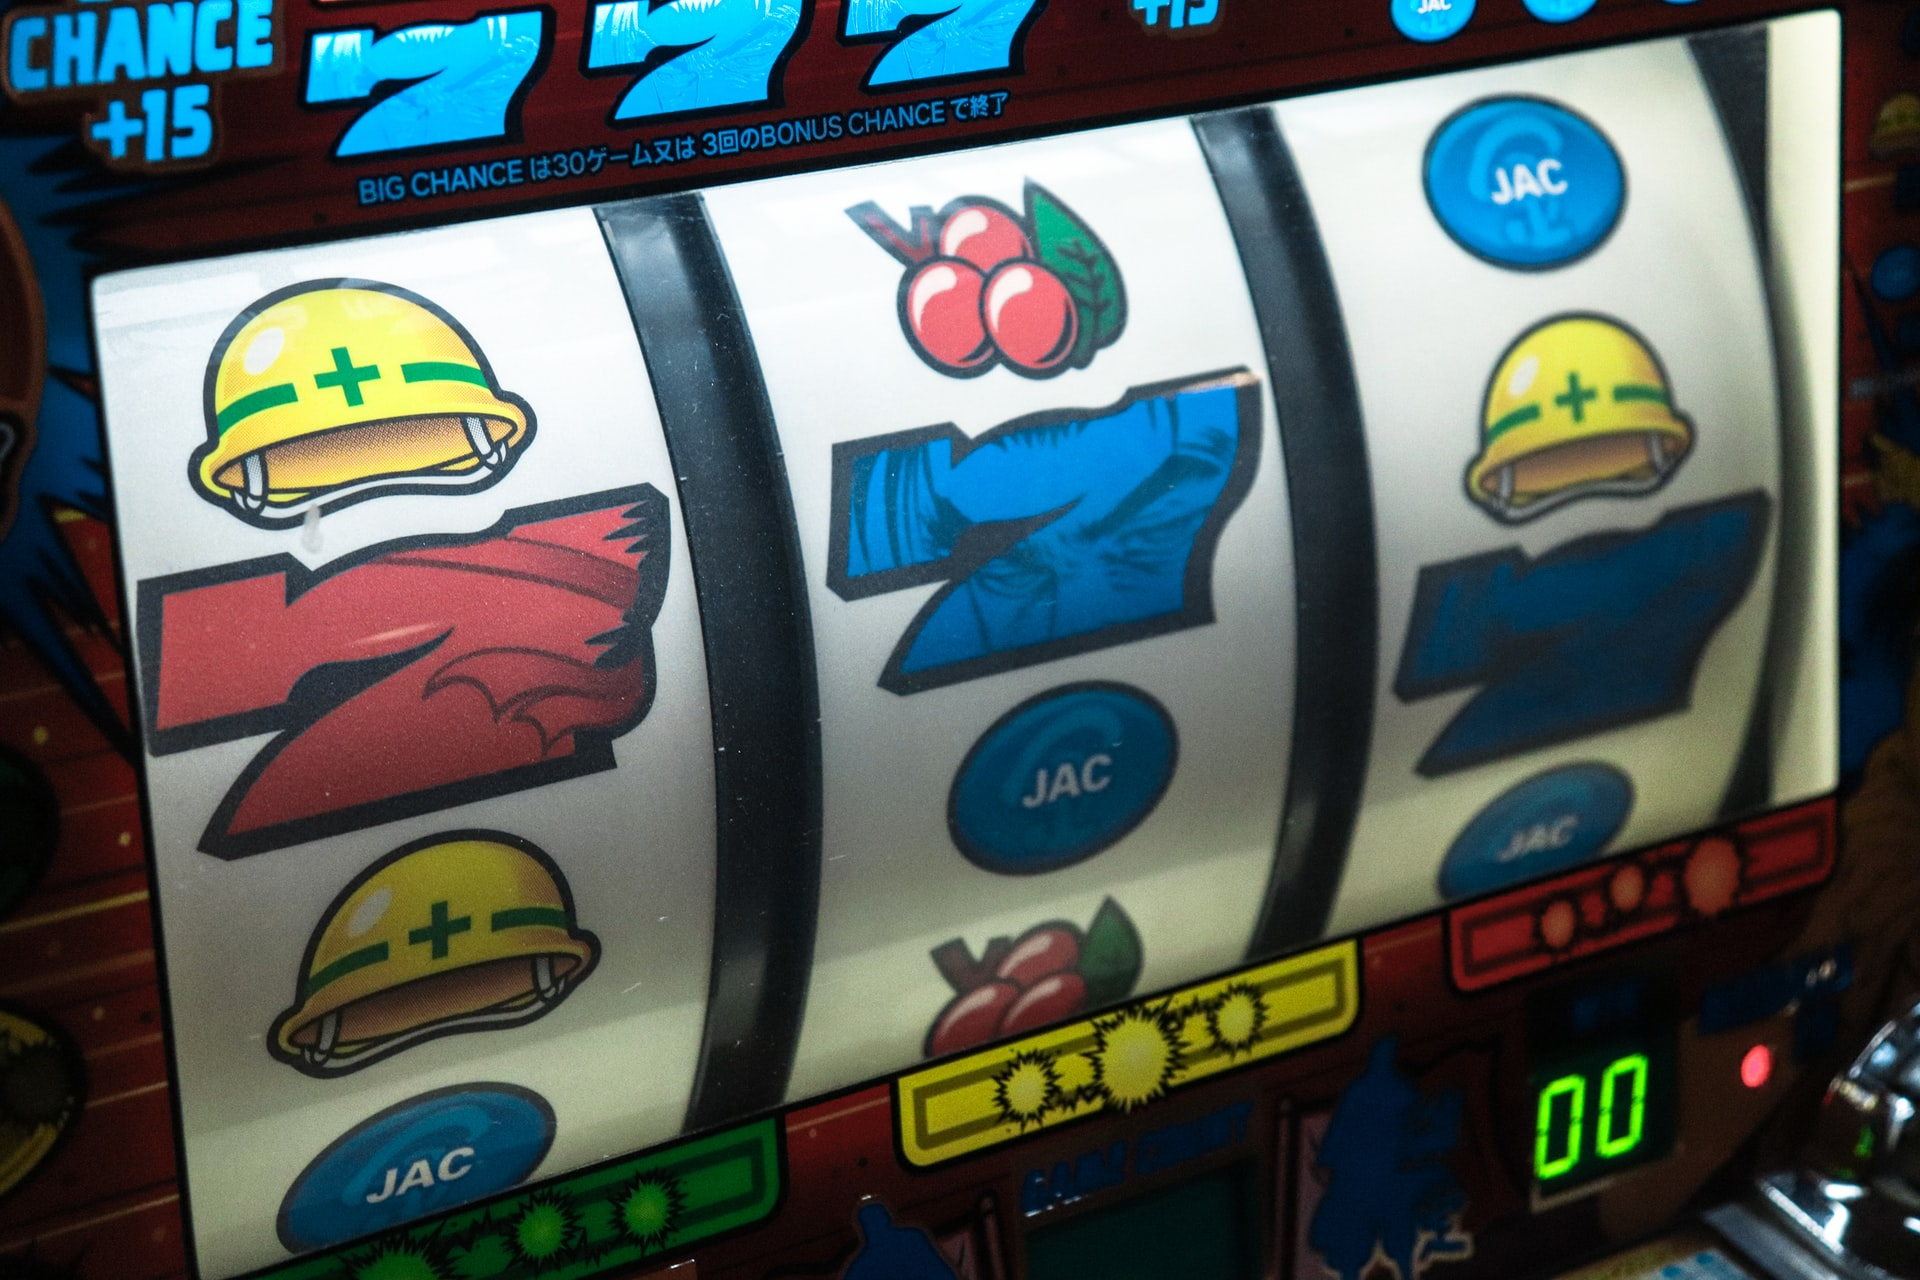 The Different Casino Slot Machine Types